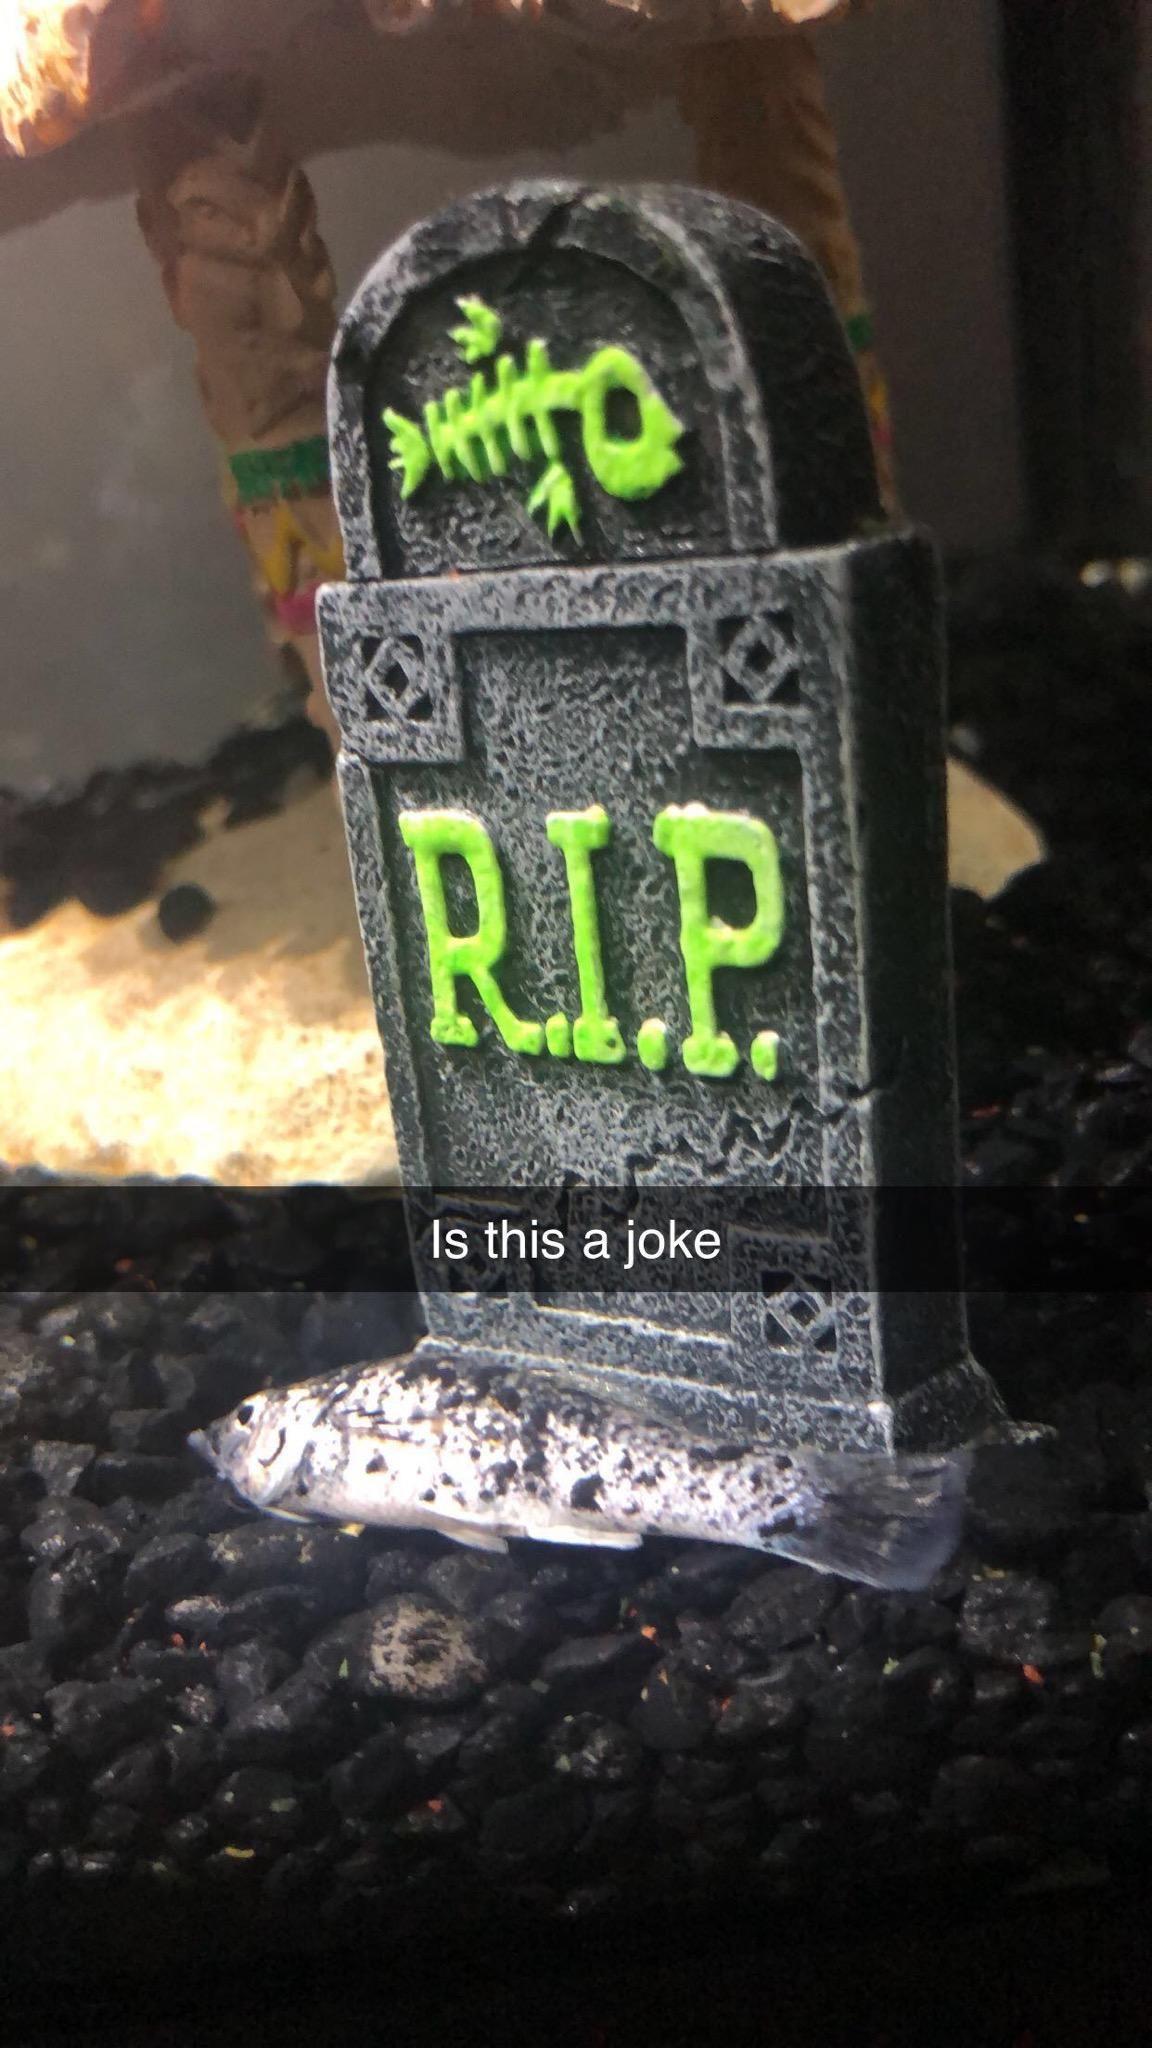 Friend's Fish Died In The Appropriate Spot